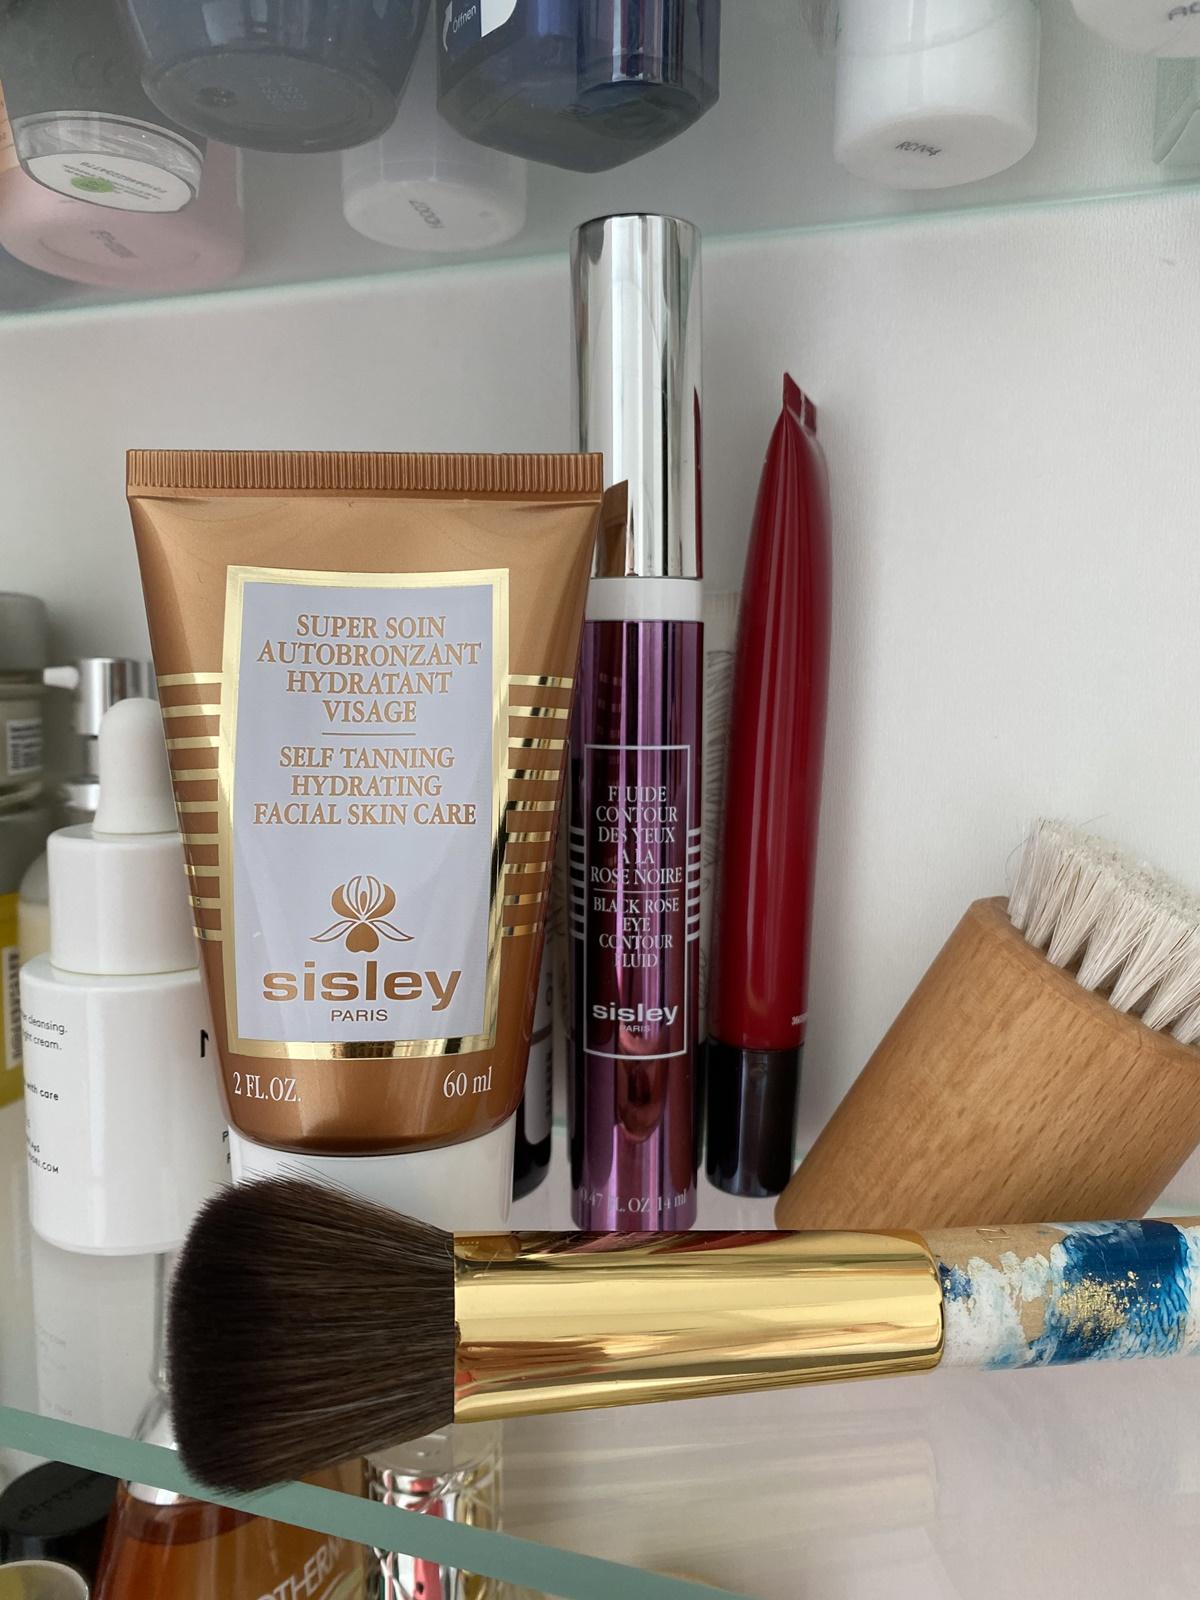 glamupyourlifestyle gesunde-braeune selbstbraeuner Sonnenschutz ue-50-blog